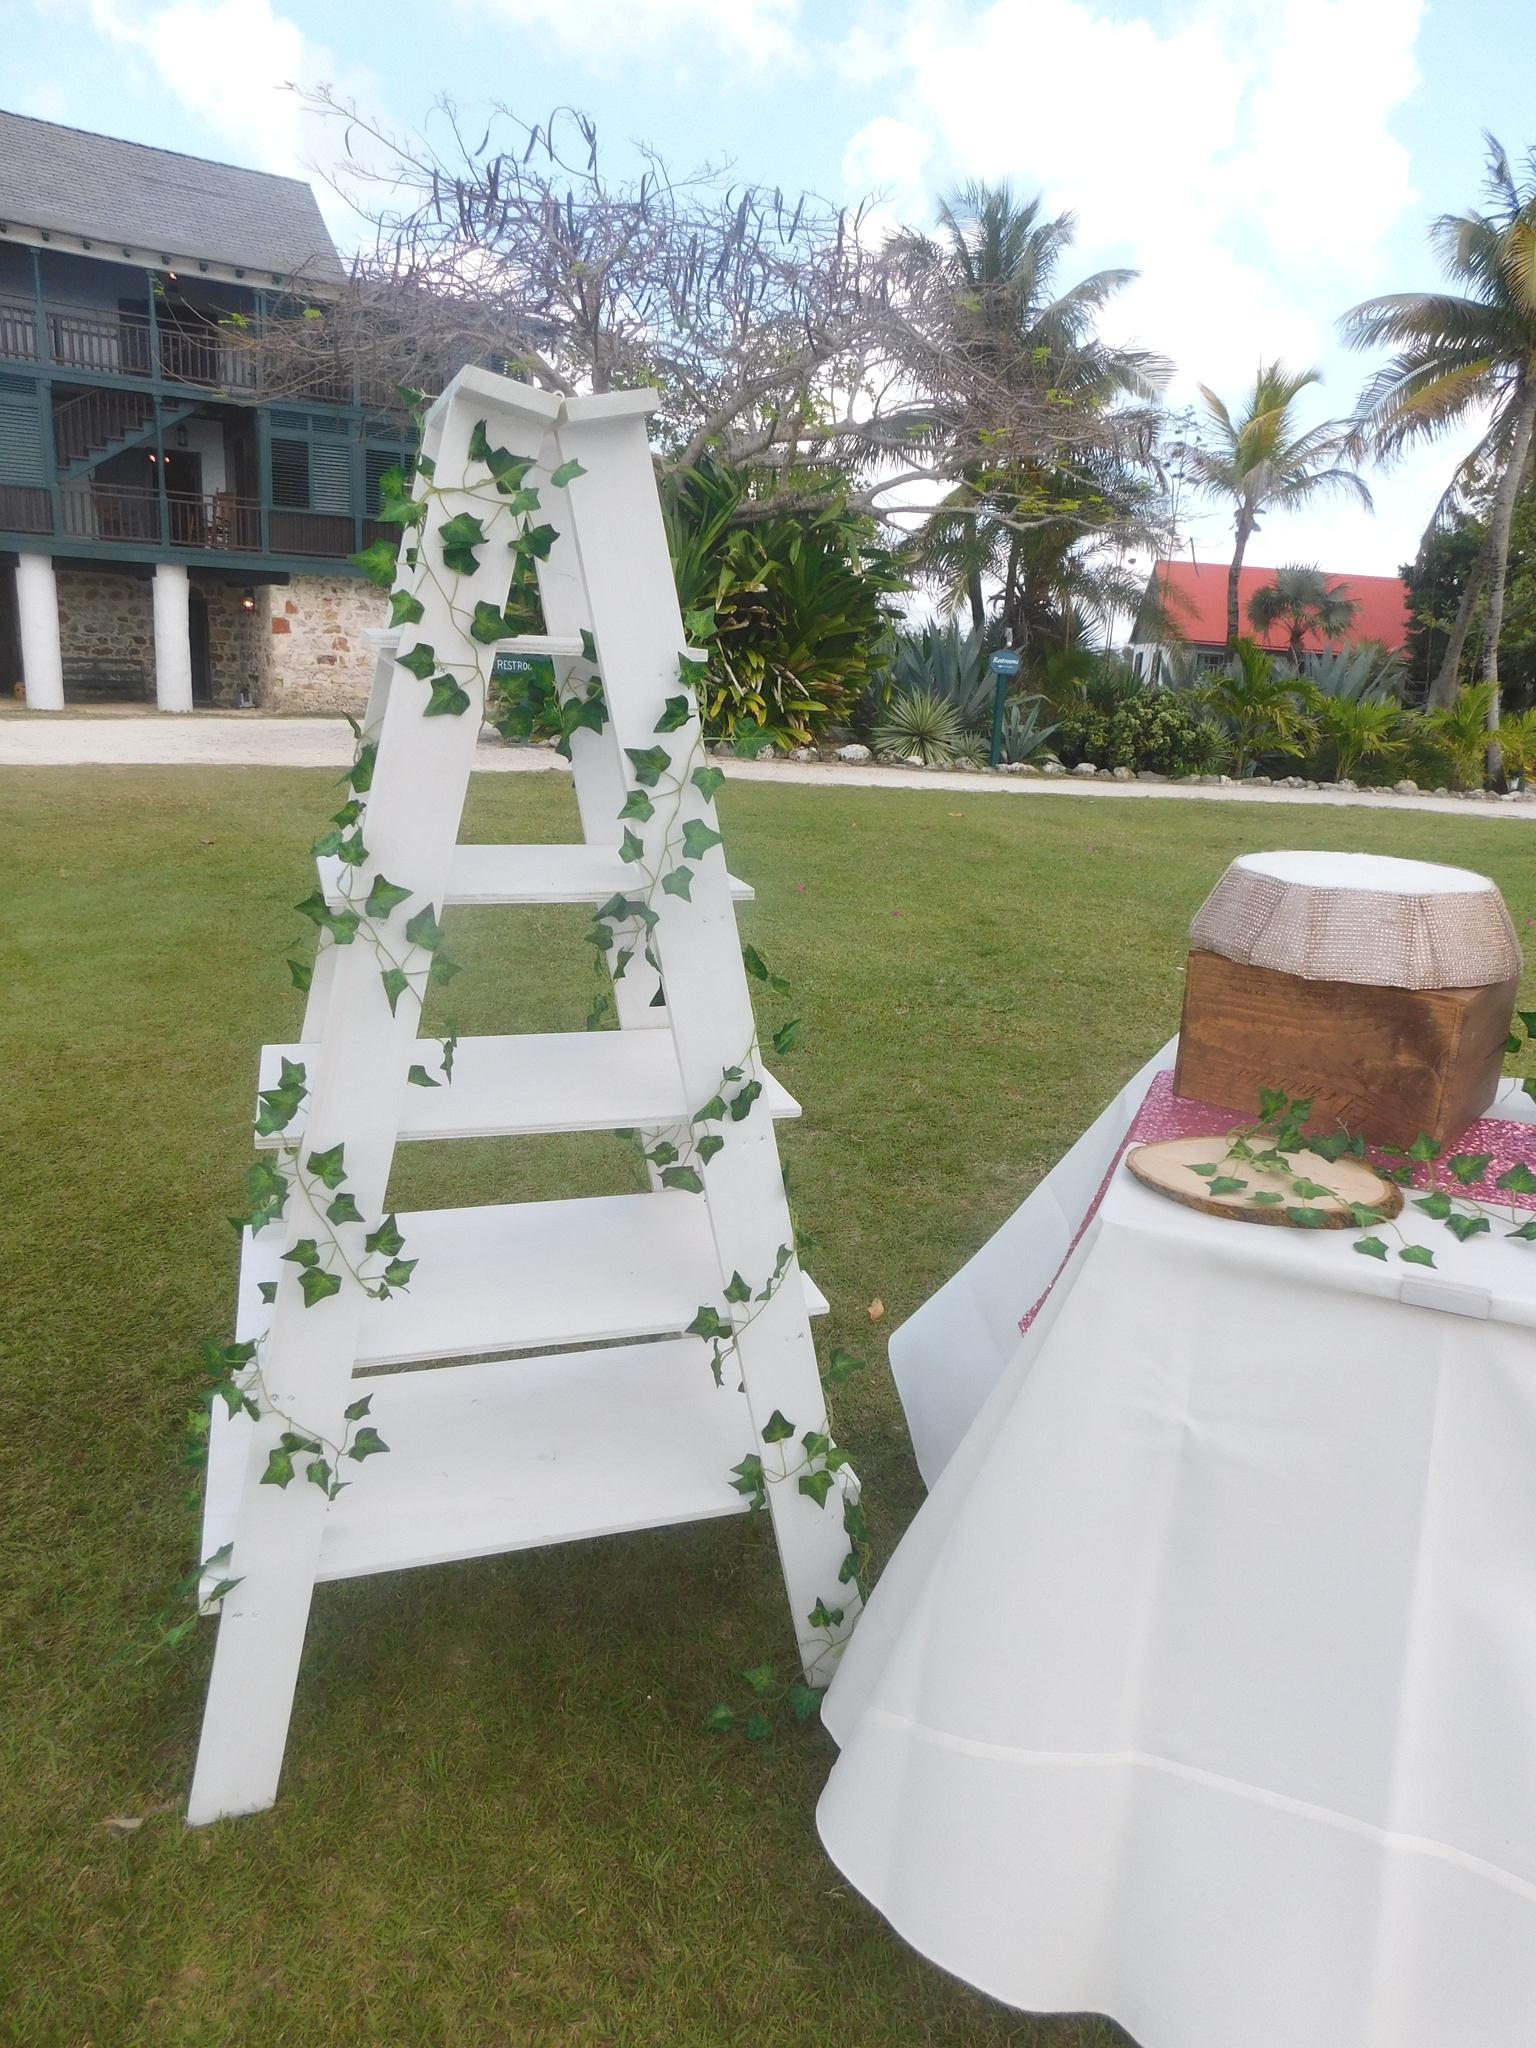 The-Flower-Dell-Wedding-Rental-1.jpg